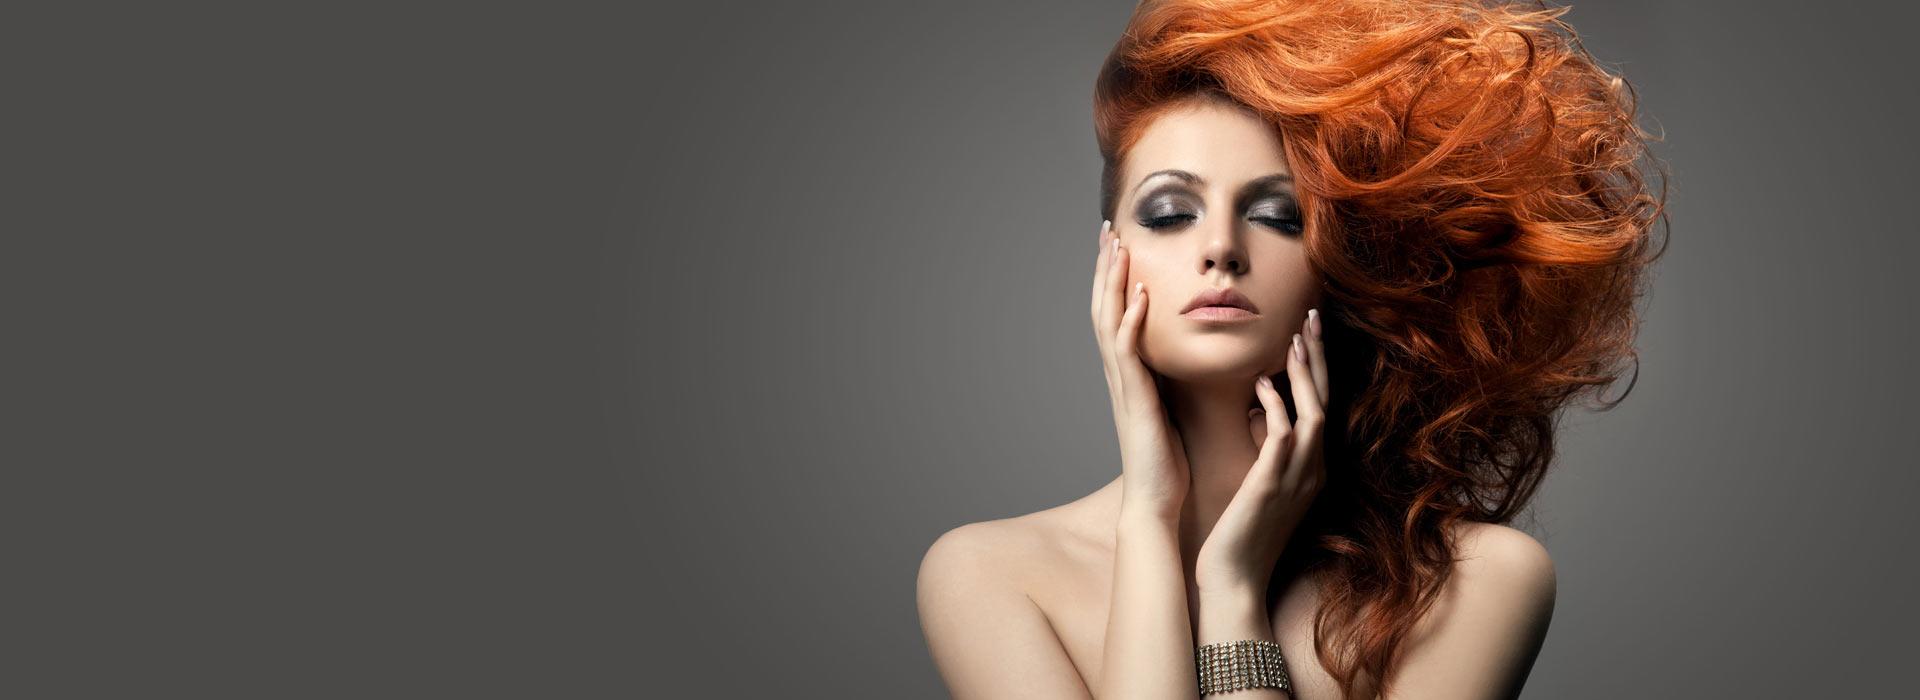 portada-3-garcia-cosmetics.jpg